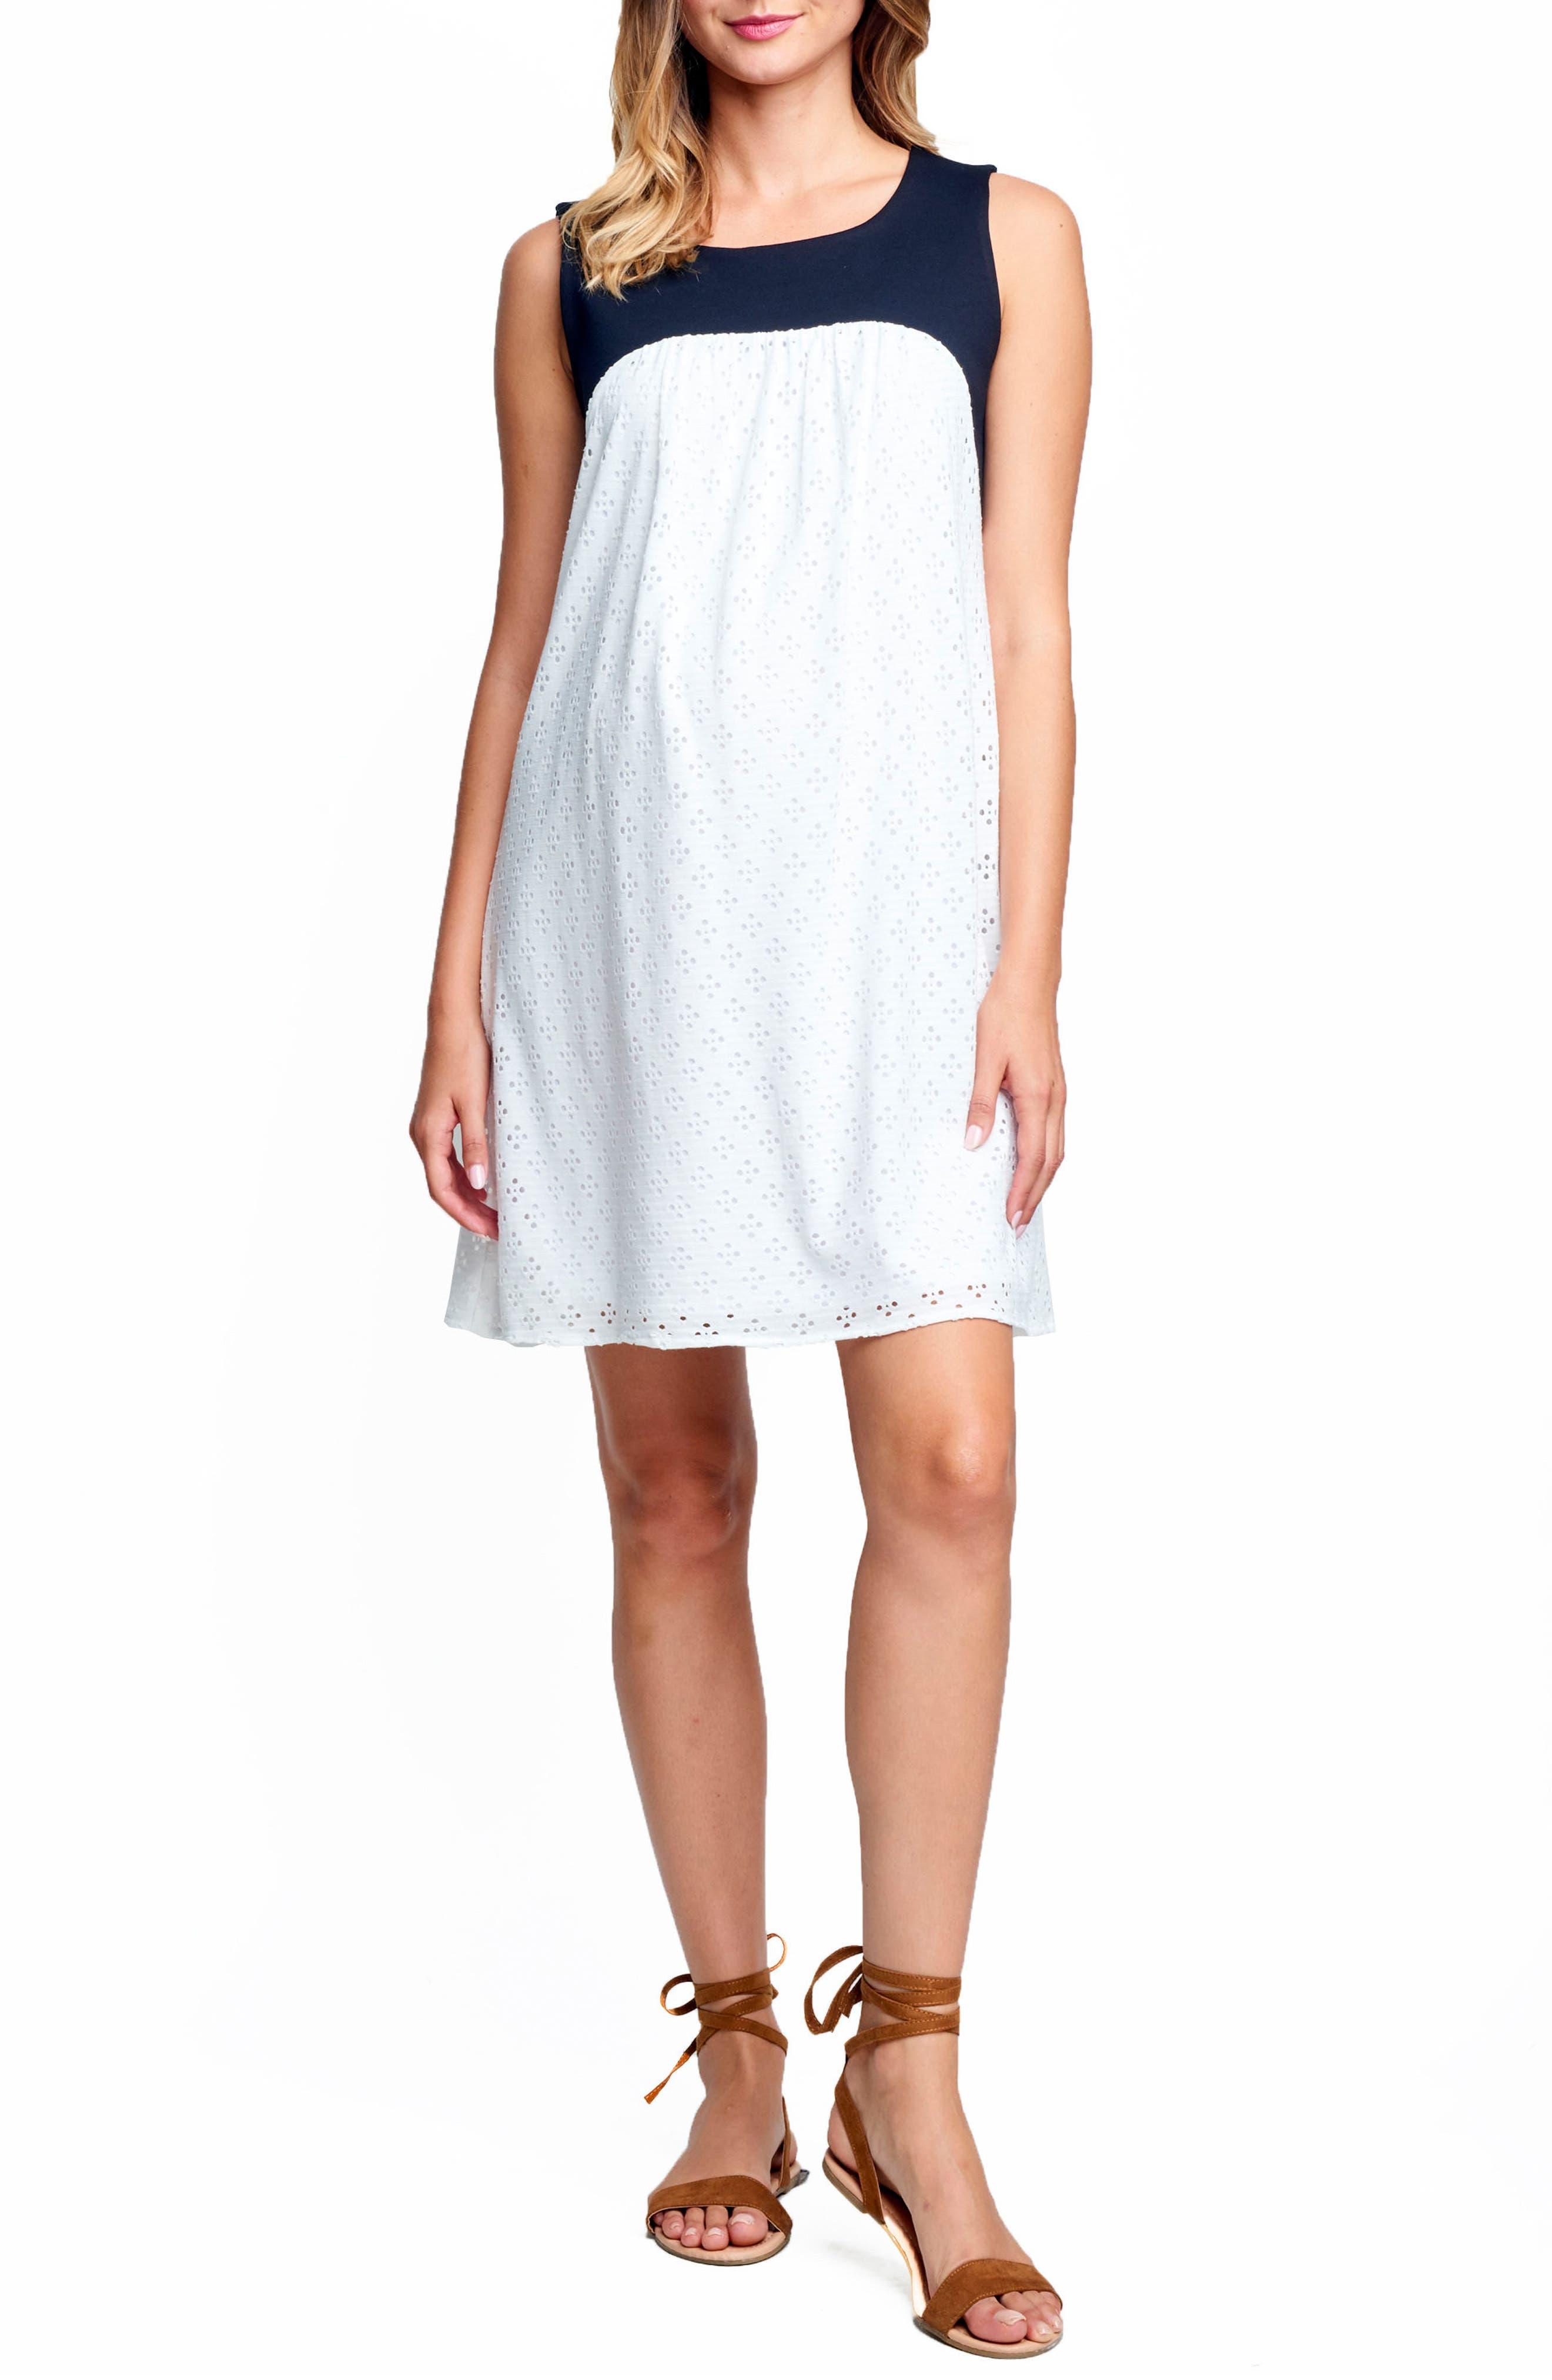 Babydoll Maternity Dress,                             Main thumbnail 1, color,                             White Eyelet/ Black